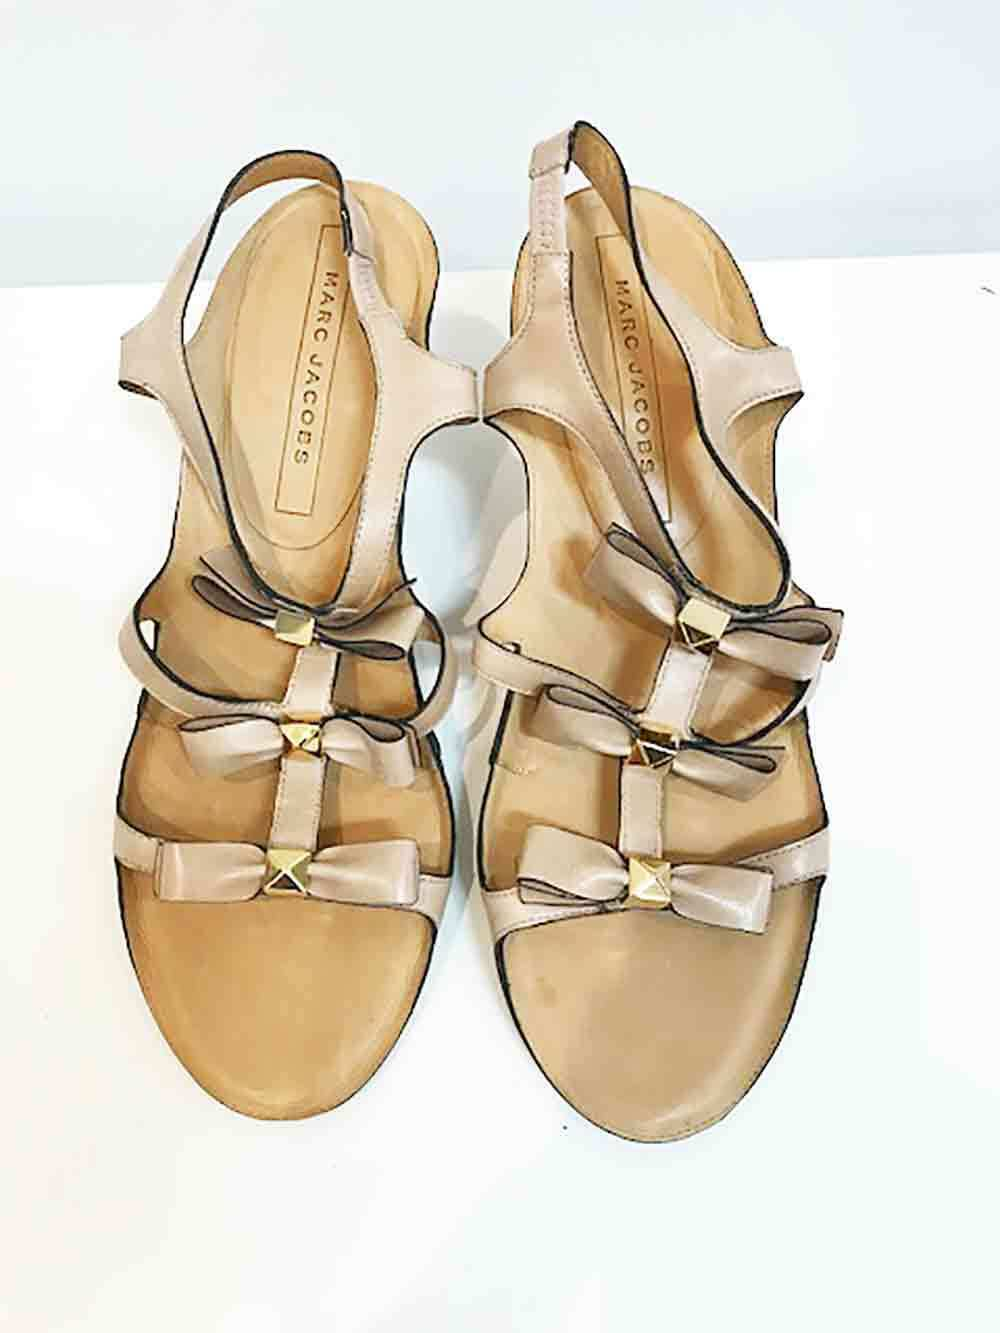 Designer BNWT Marc Jacobs Size 39 Tan Leather Bow Detail Women's Heels